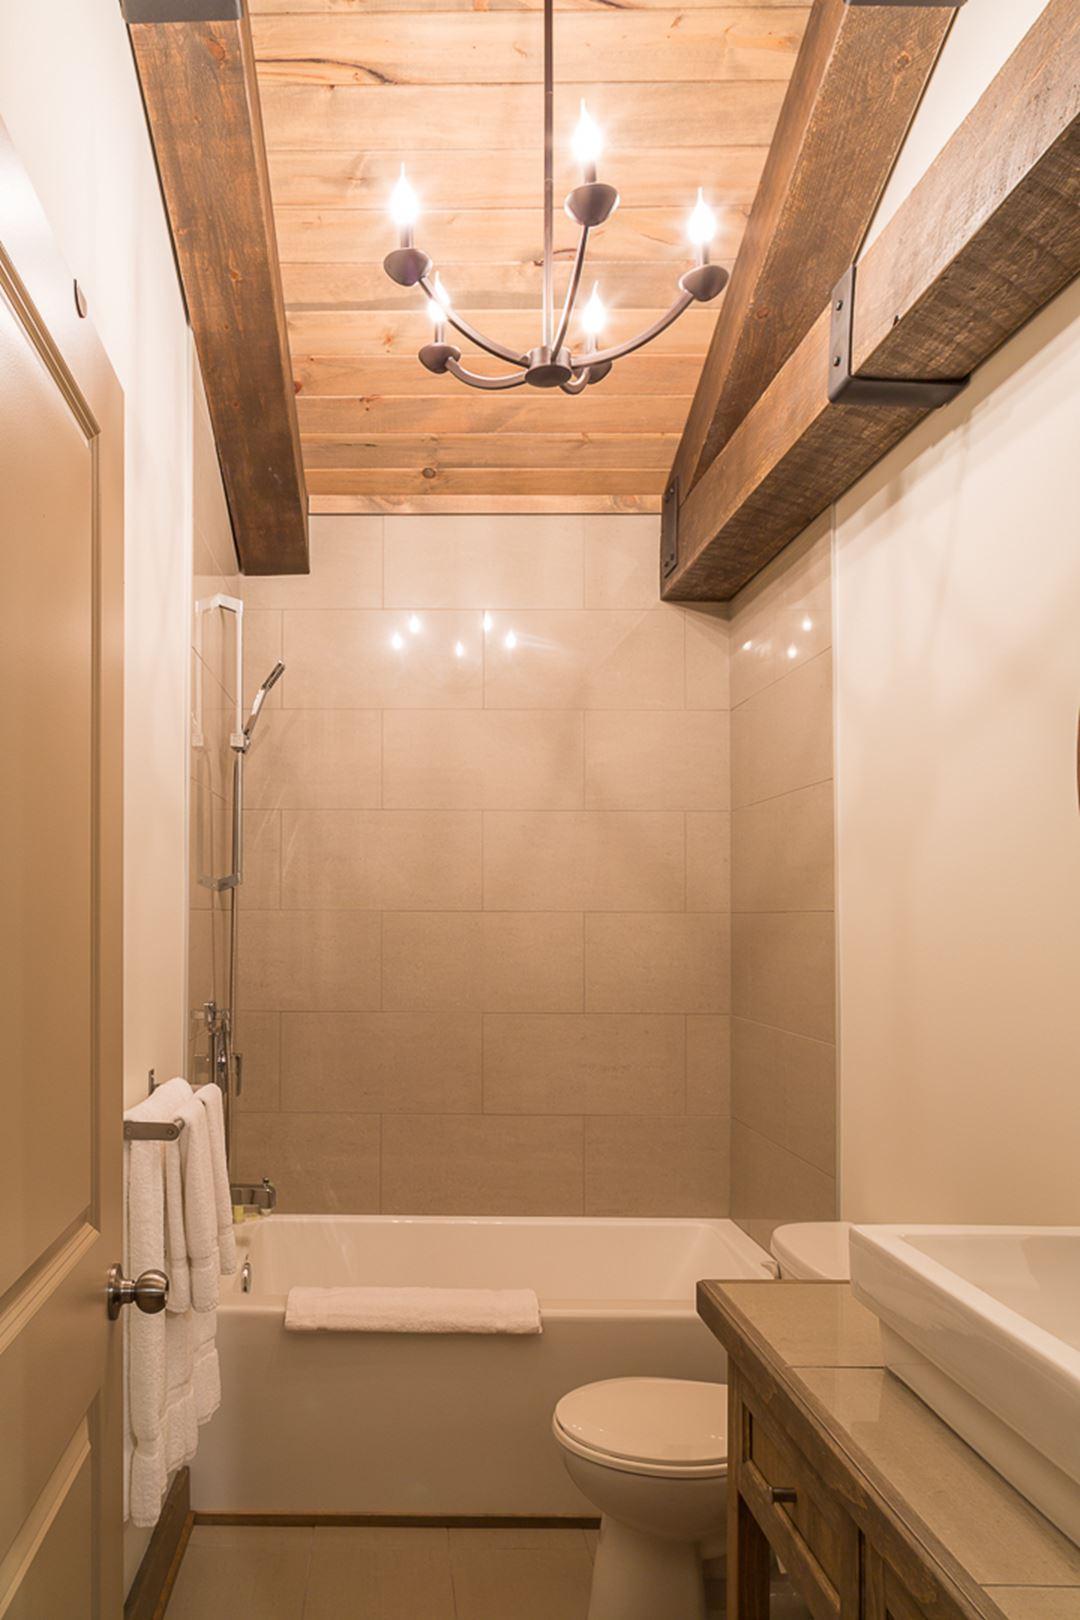 Hôtel-Spa Le Suisse restroom